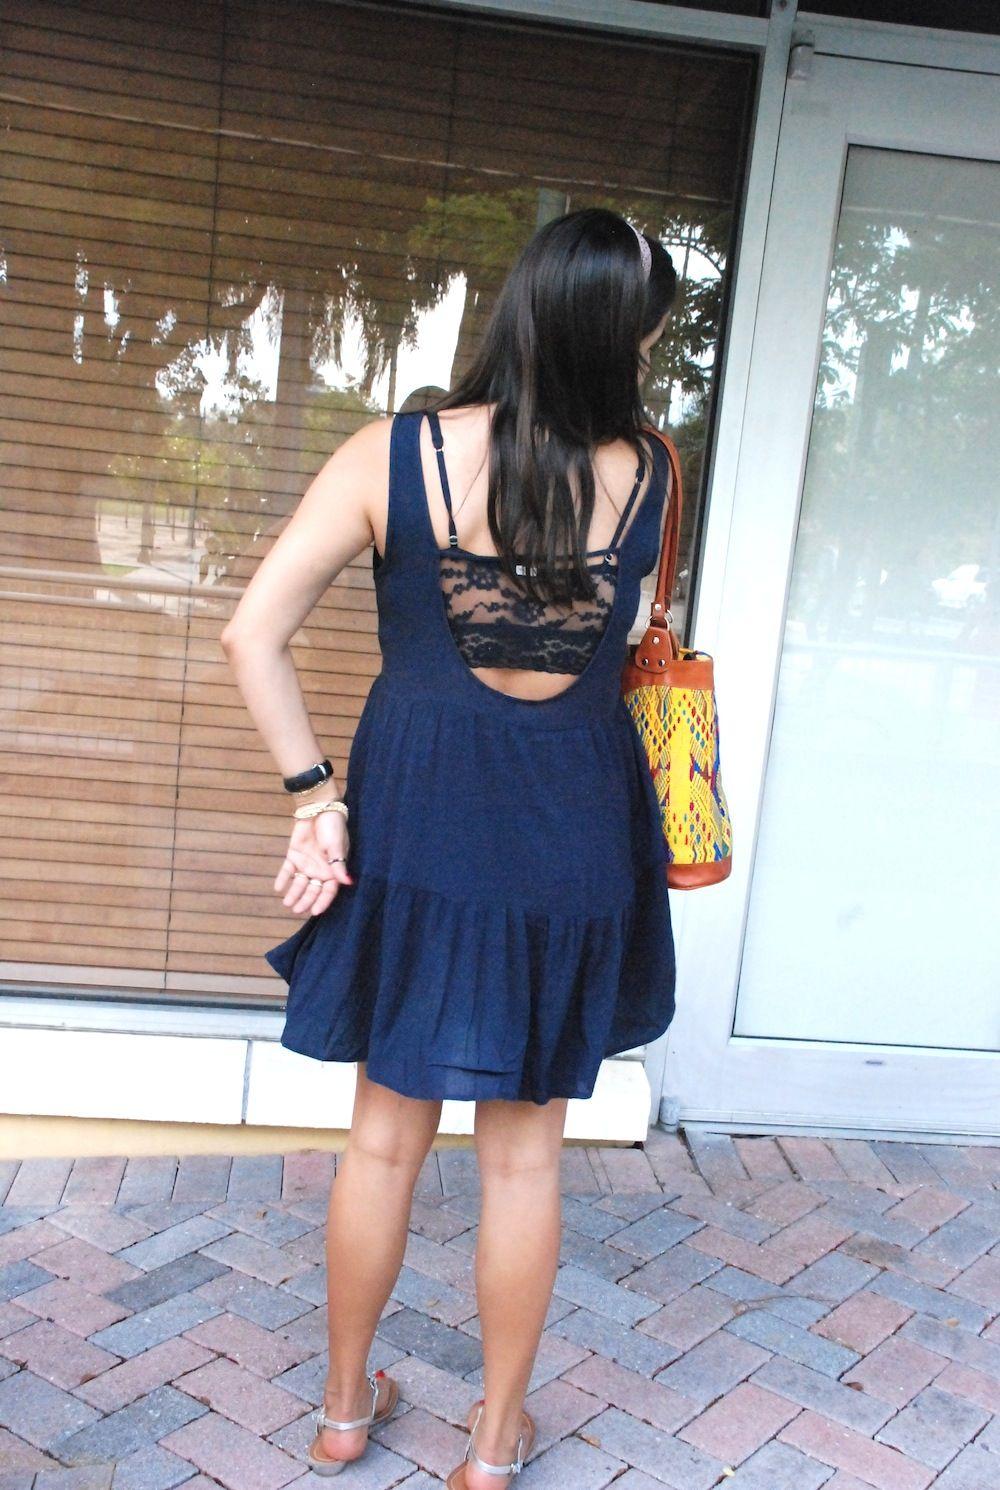 lace details! #AHintofLife #ootd